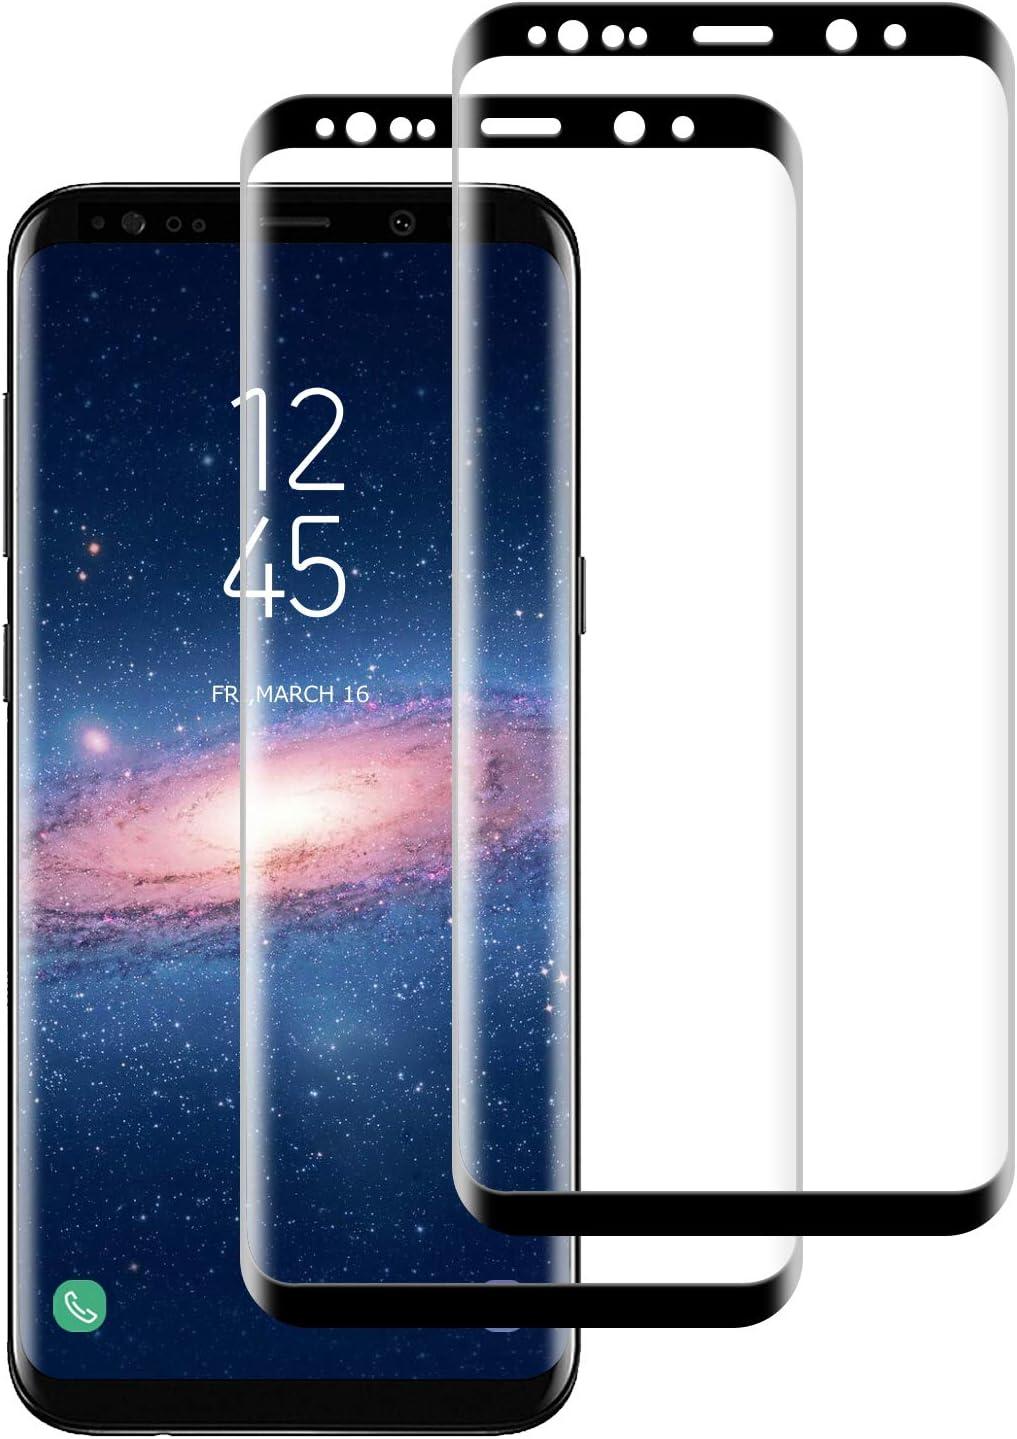 DASFOND Protector Pantalla de Samsung Galaxy S9 Plus Cristal Templado [Cobertura Completa, 9H Dureza, Alta Definicion, Alta sensibilidad, Protector de Pantalla para Samsung Galaxy S9 Plus, 2 Piezas